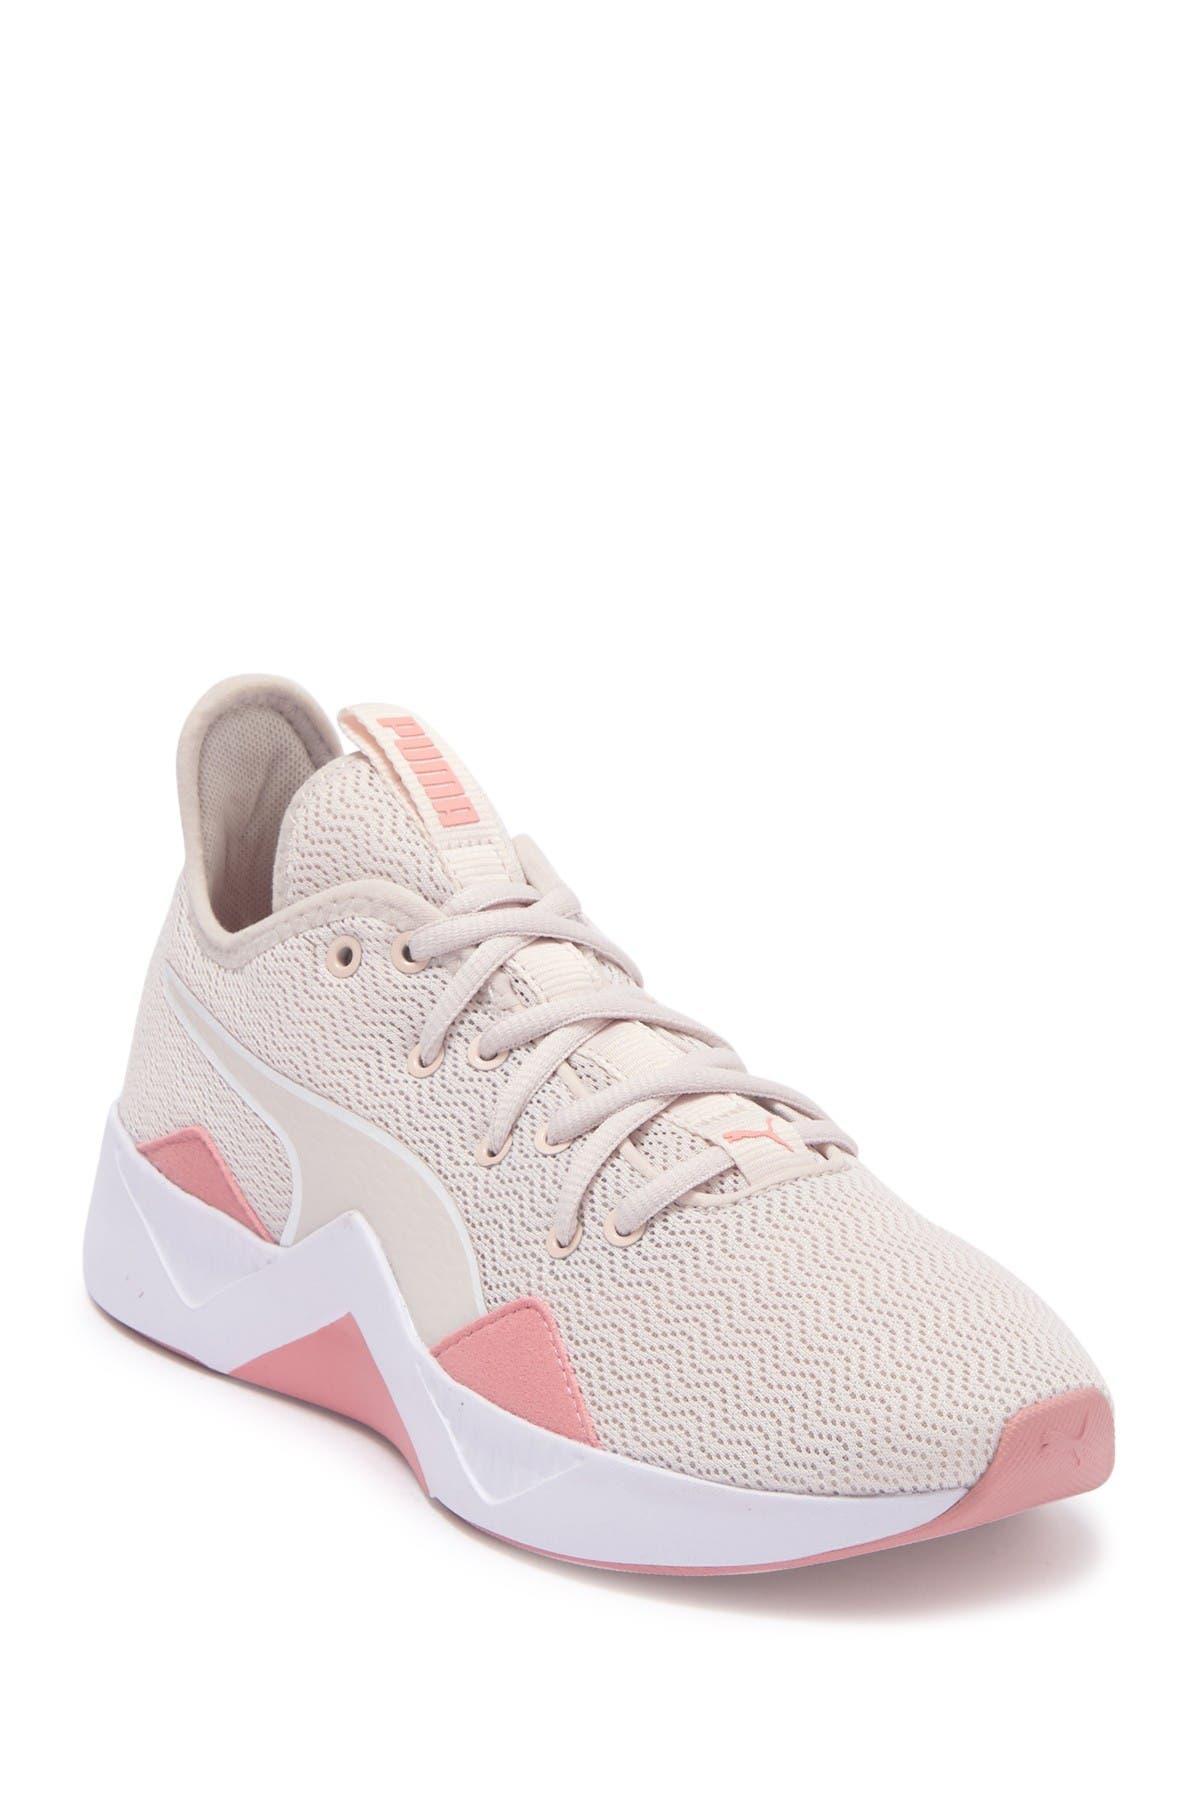 PUMA | Incite FS Shift Training Shoe